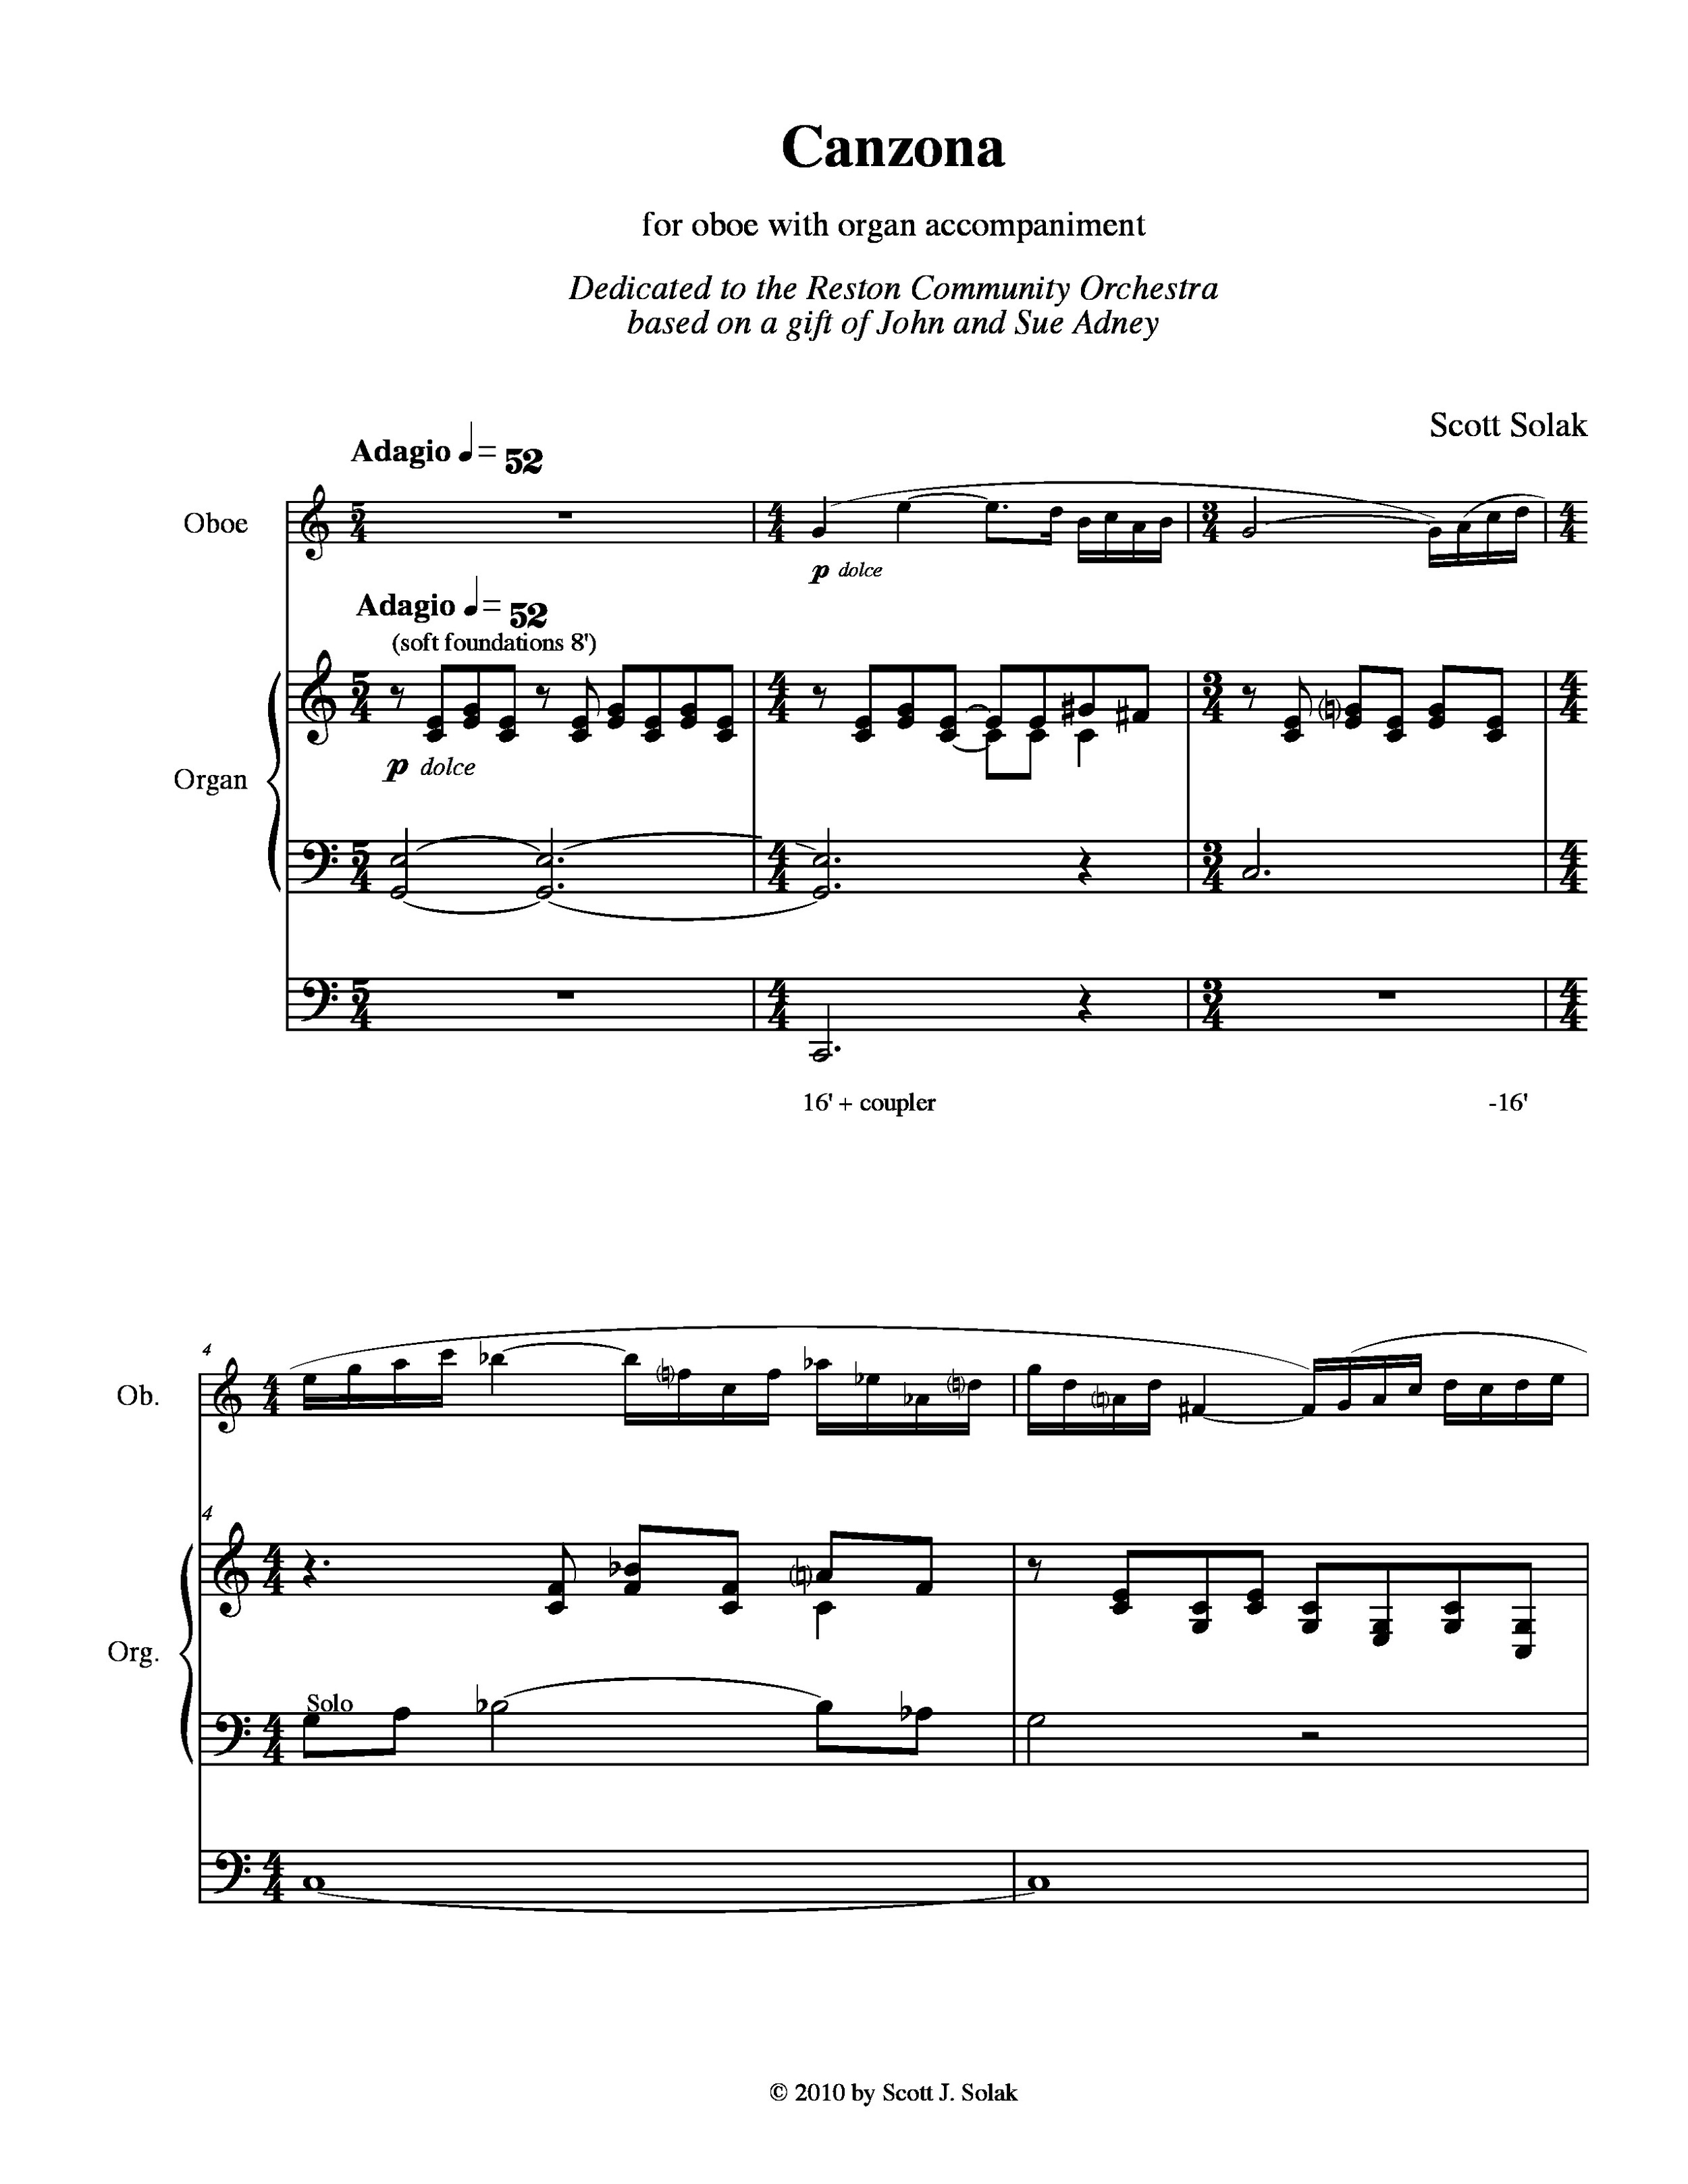 Canzona oboe-organ web-page-0.jpg